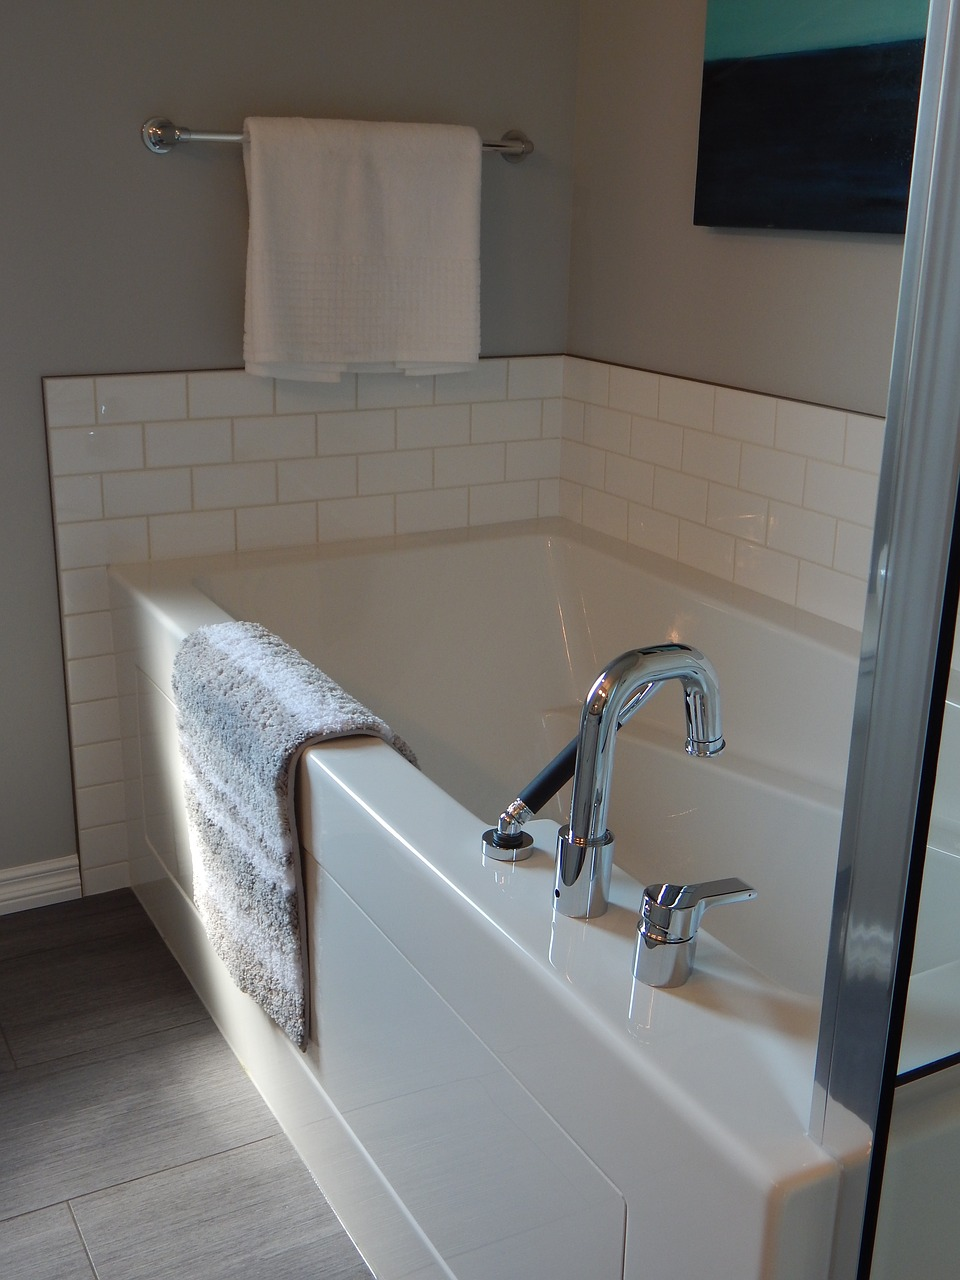 bathtub-890561_1280.jpg